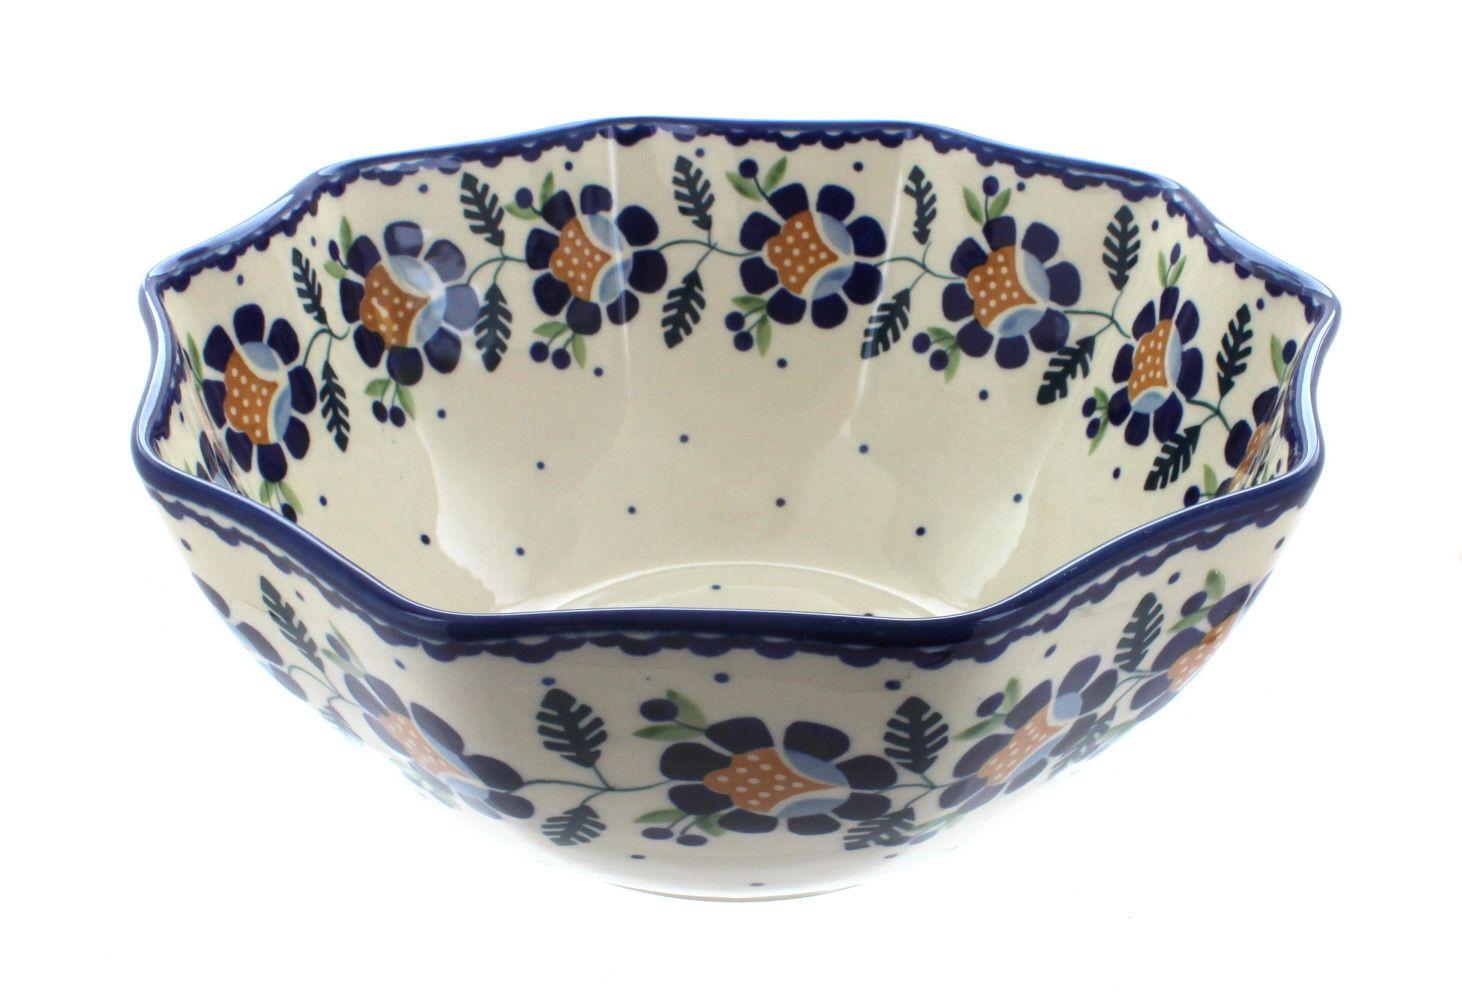 Sunflower Small Decagonal Serving Bowl - Blue Rose Polish Pottery